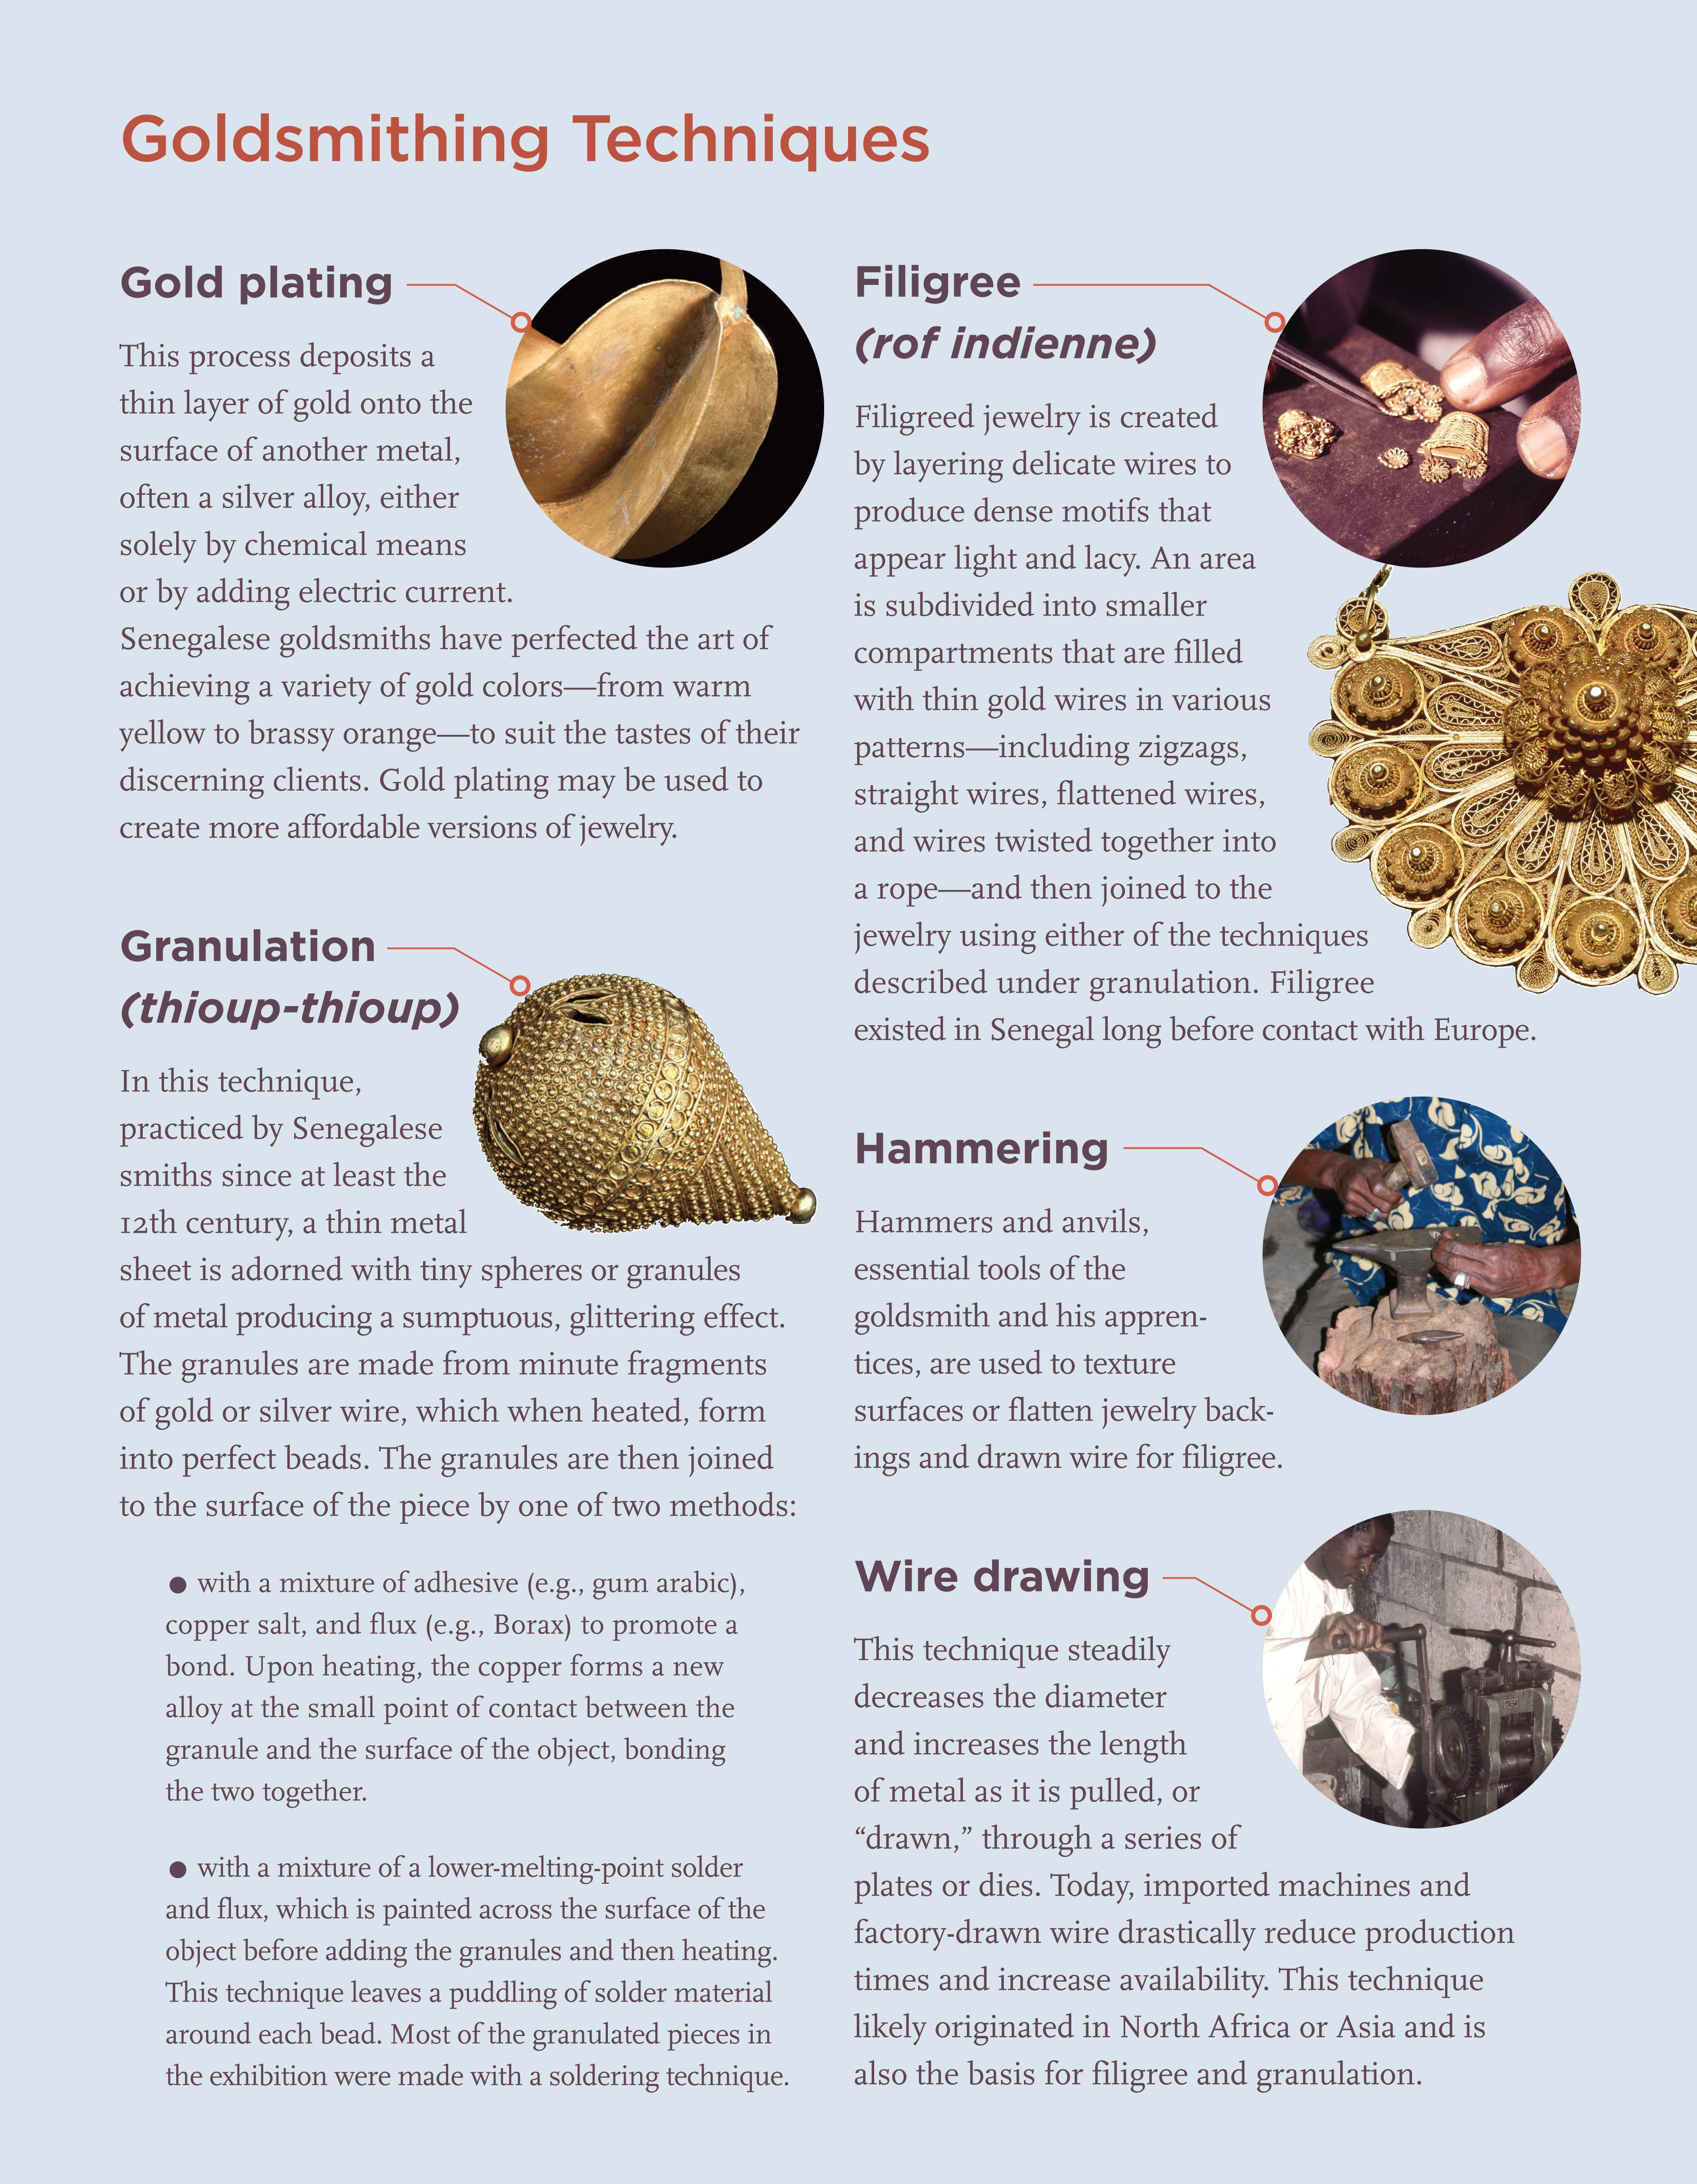 Goldsmithing Techniques